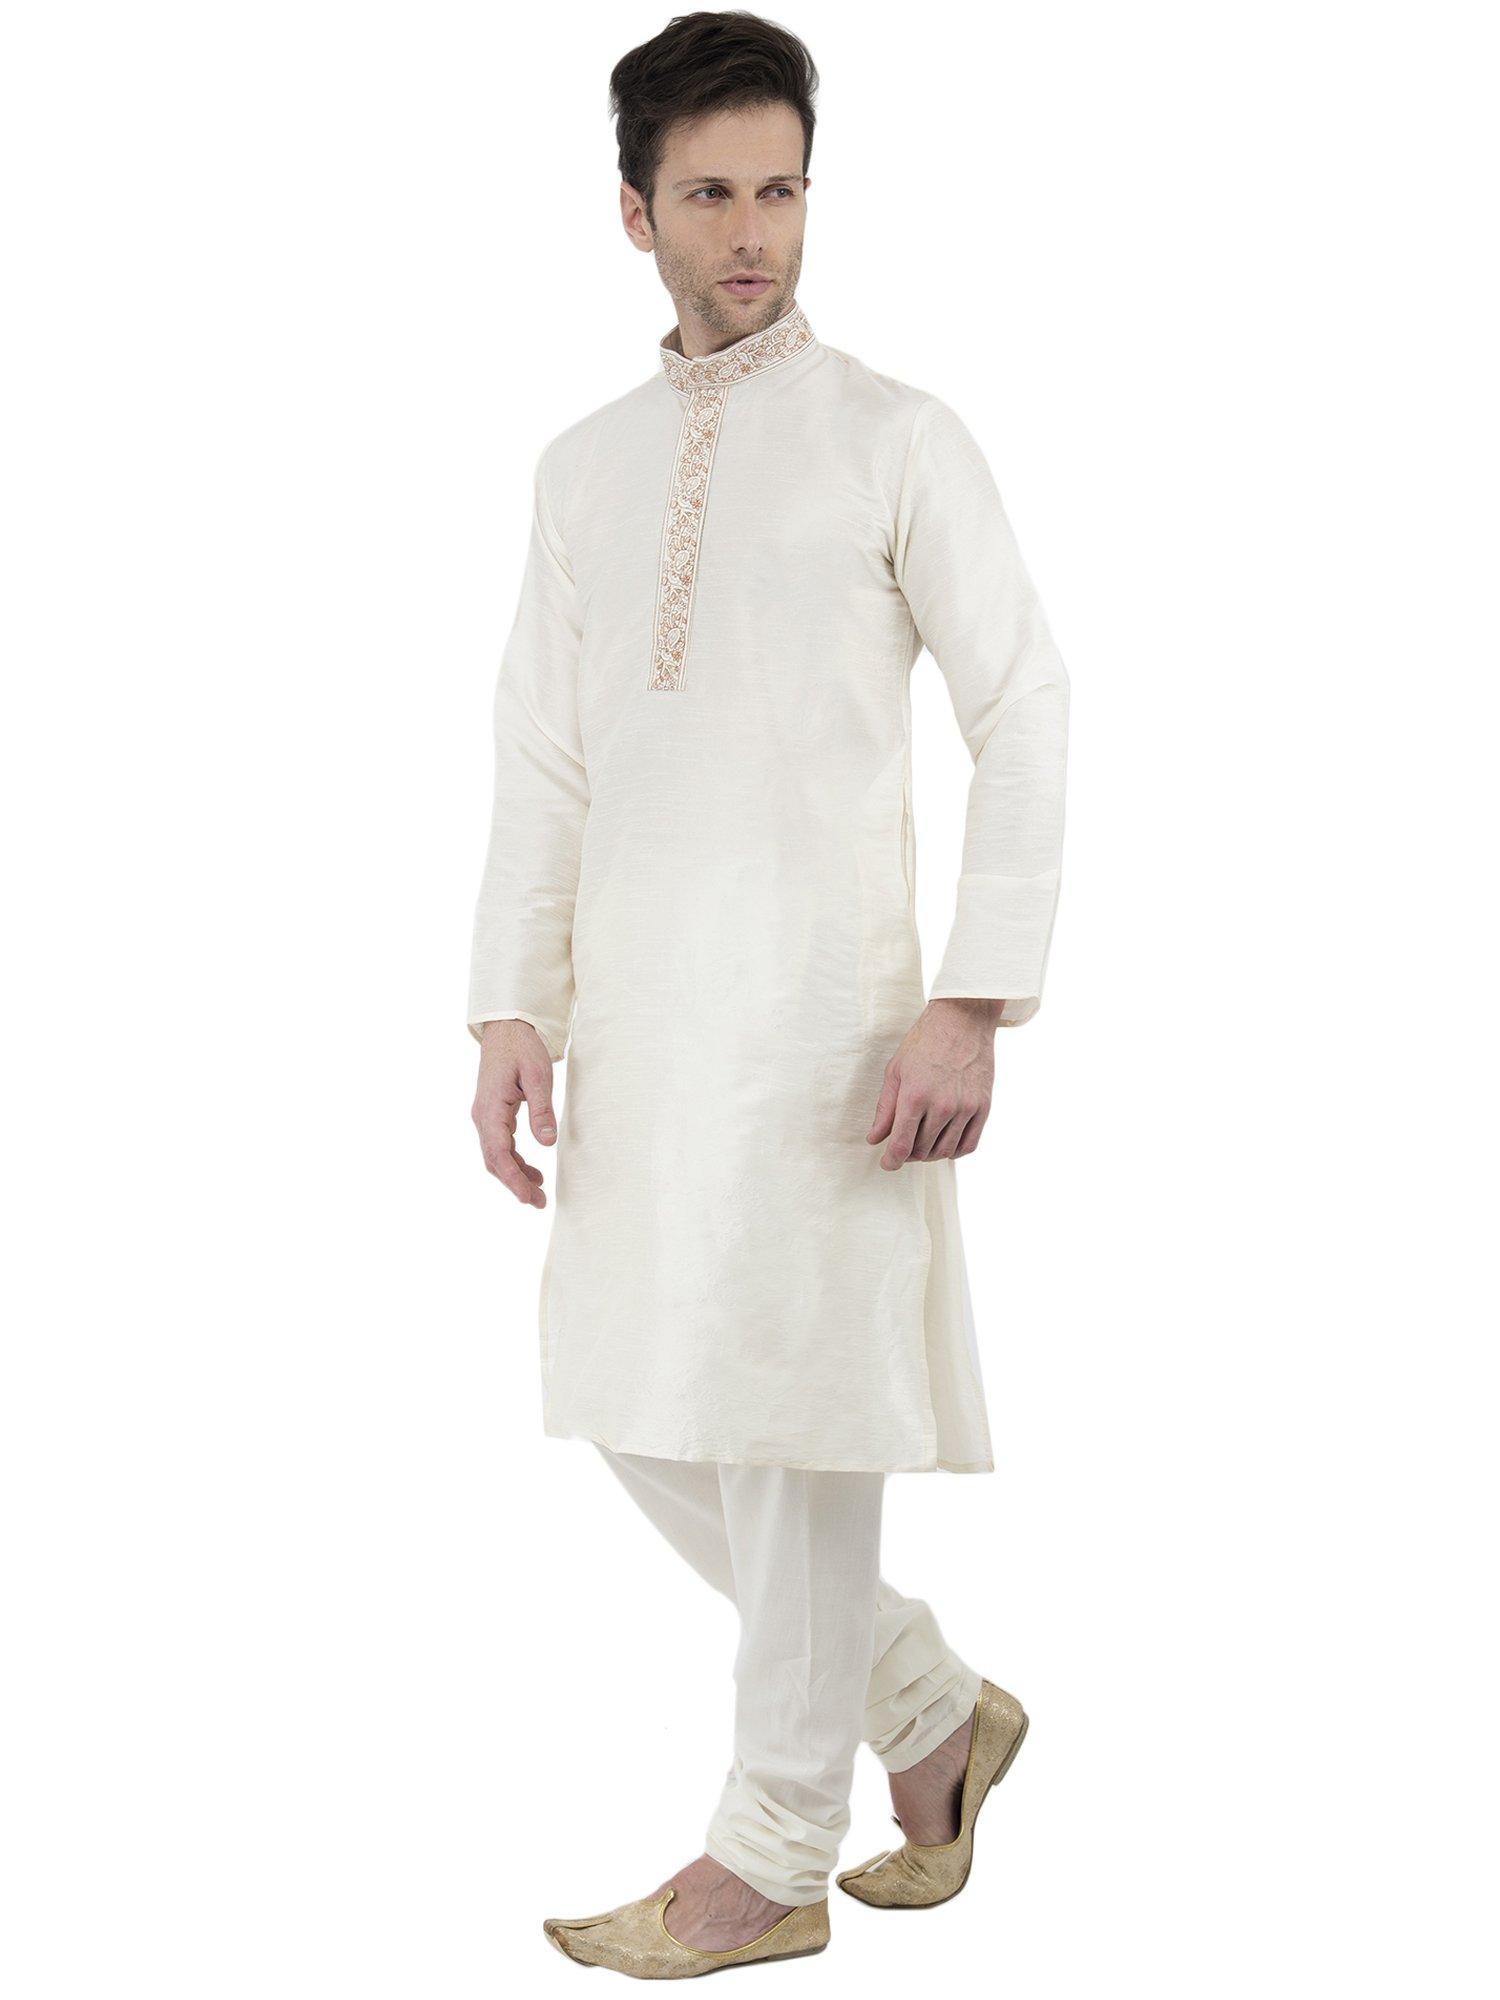 Long Sleeve Button Down Shirt Mens Kurta Pajamas Set Handmade Traditional Indian Costume Offwhite -M by SKAVIJ (Image #3)